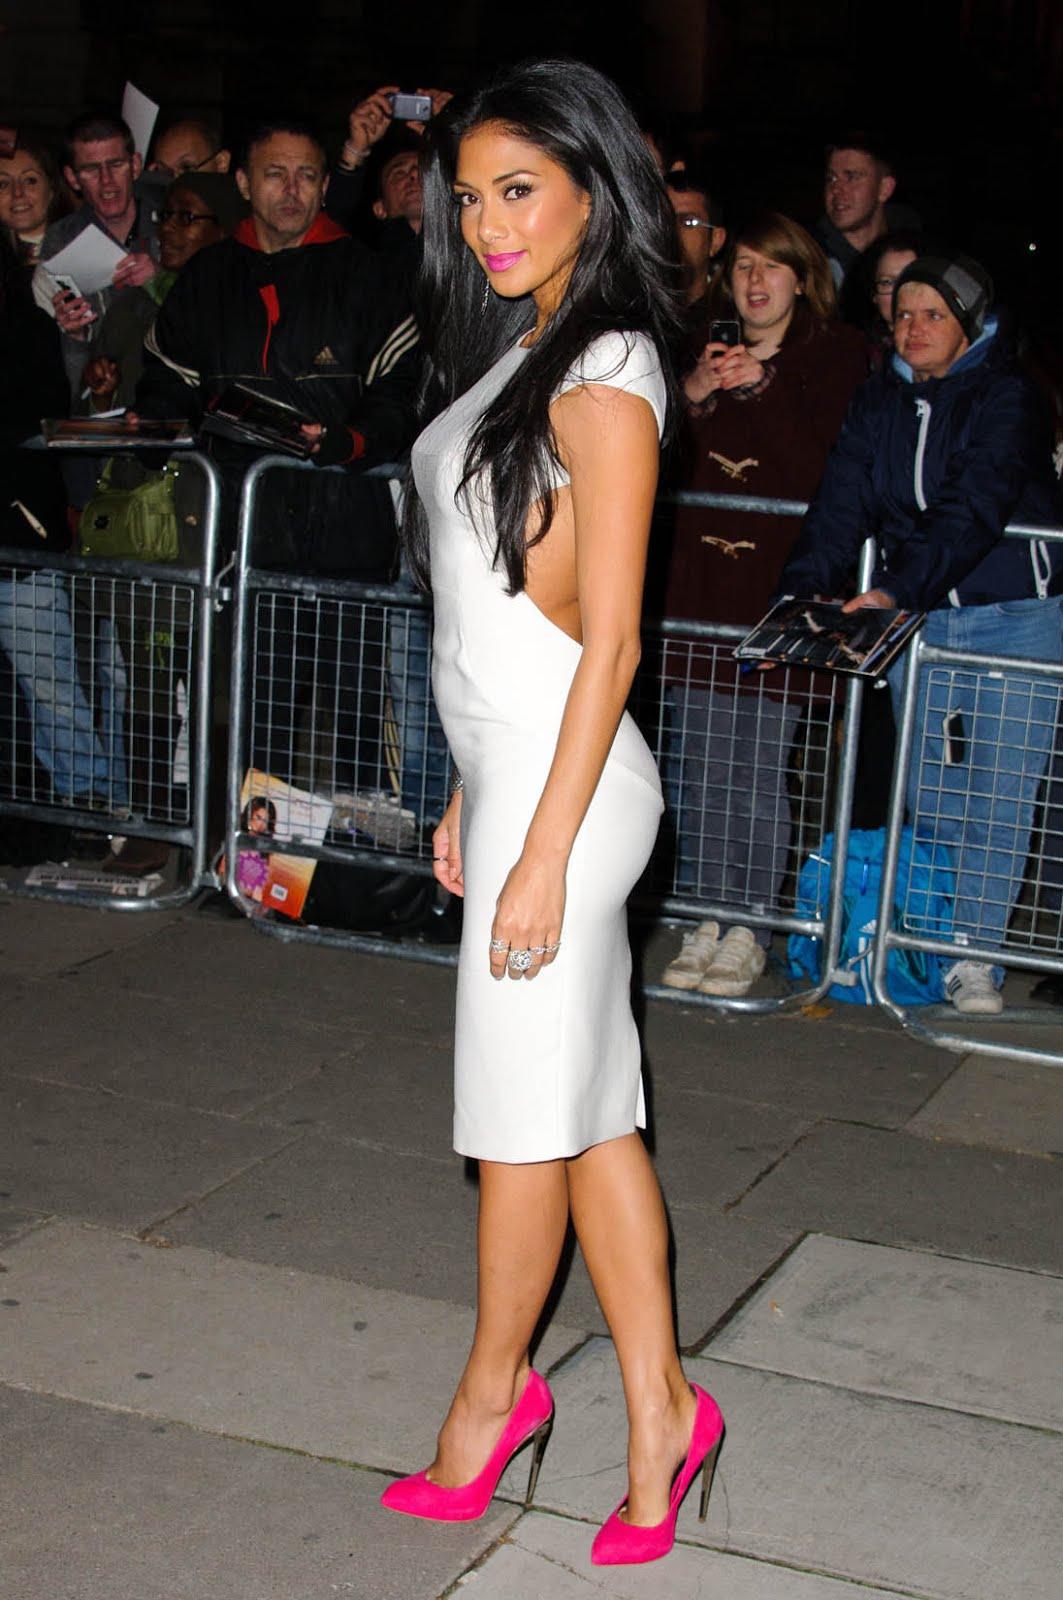 http://3.bp.blogspot.com/-sPEvwGhs-qY/UJFapObHkcI/AAAAAAAAbZI/pBATwe1pUeM/s1600/nicole_scherzinger_white_dress_go_14.jpg